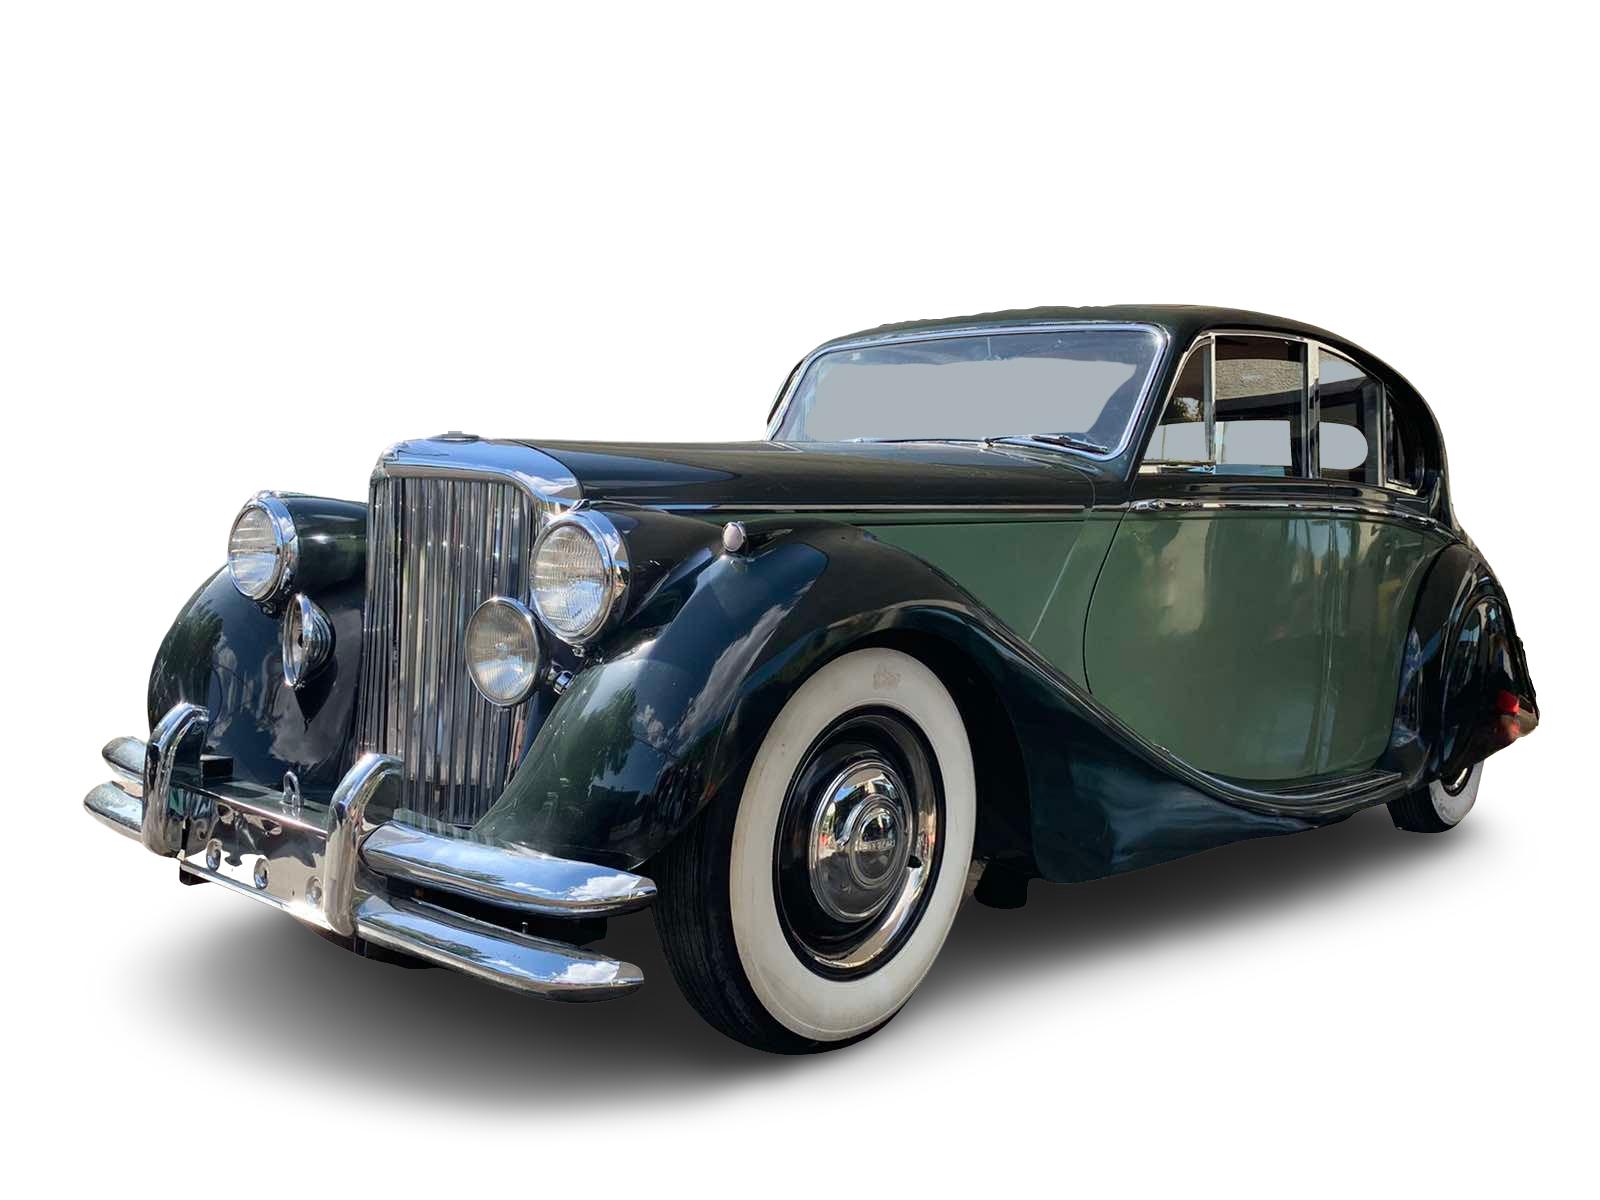 1949 Jaguar Mark V Saloon